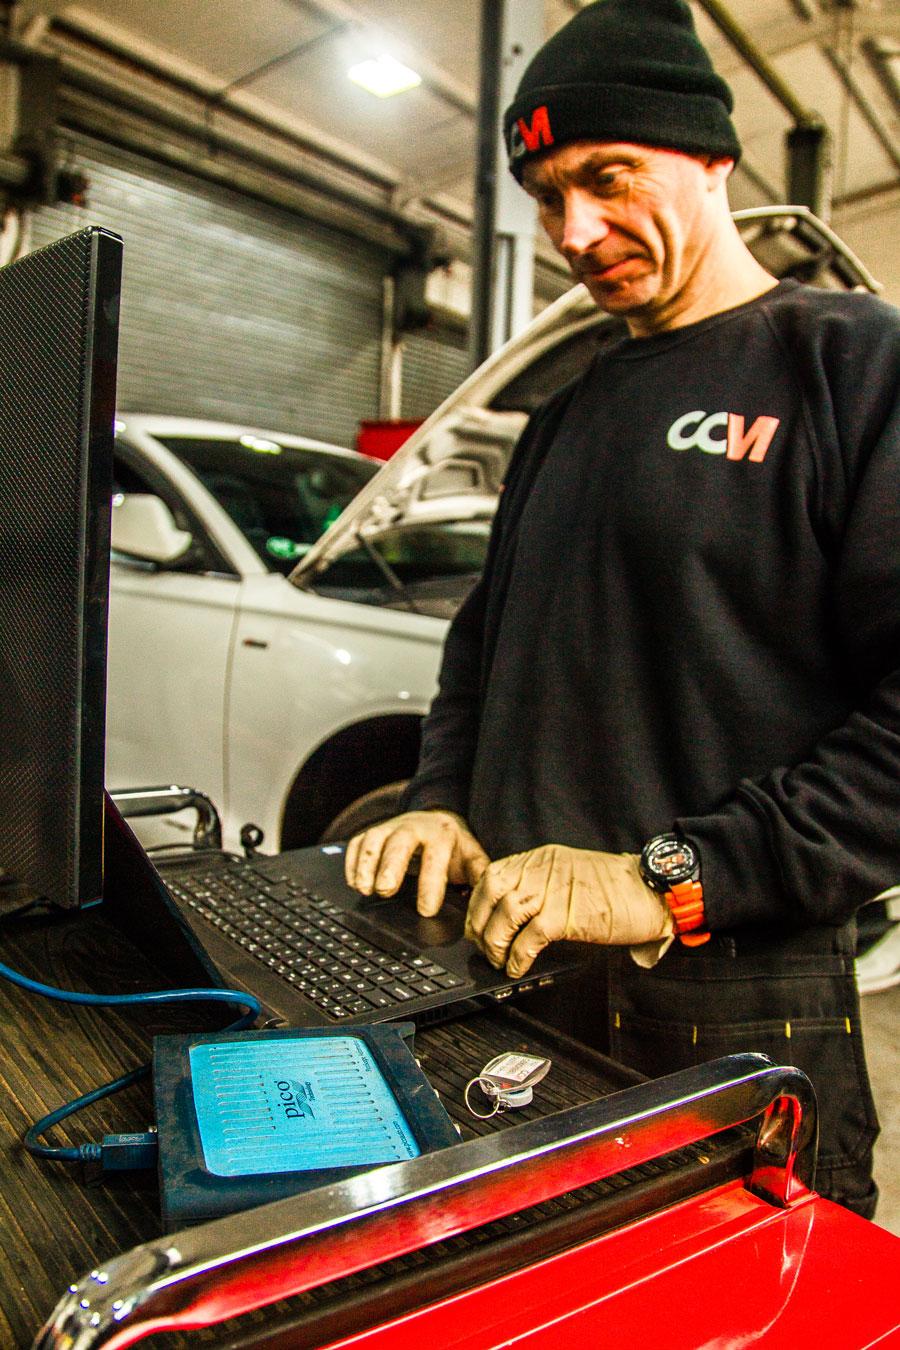 VAG Diagnostics at CCM Garages